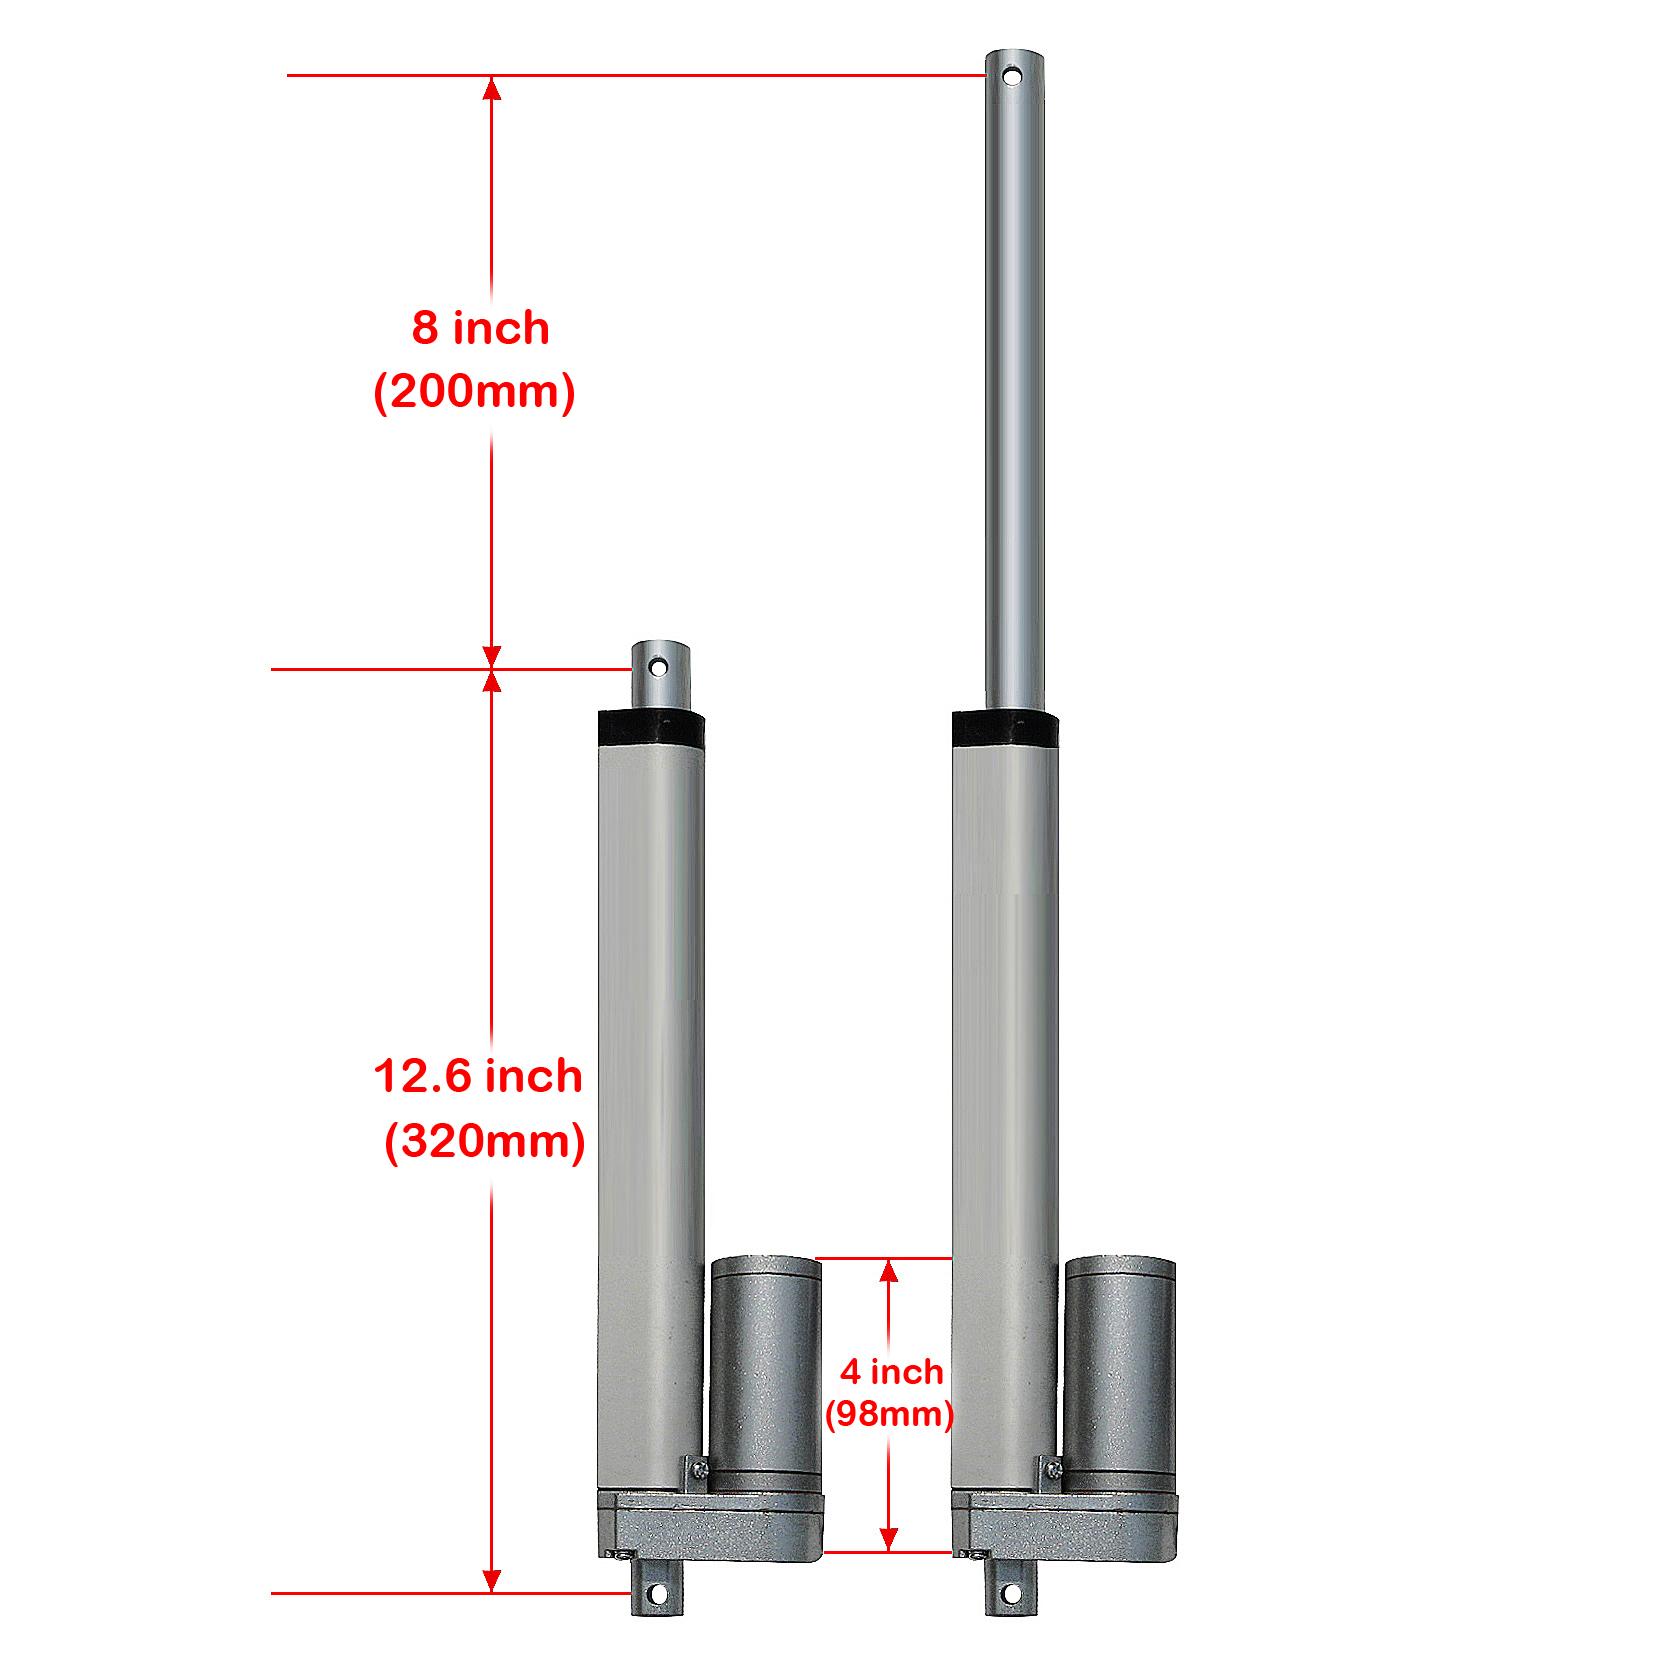 4PCS Linearantrieb 12V DC Elektrischer Linearmotor 150KG Pound Max Lift